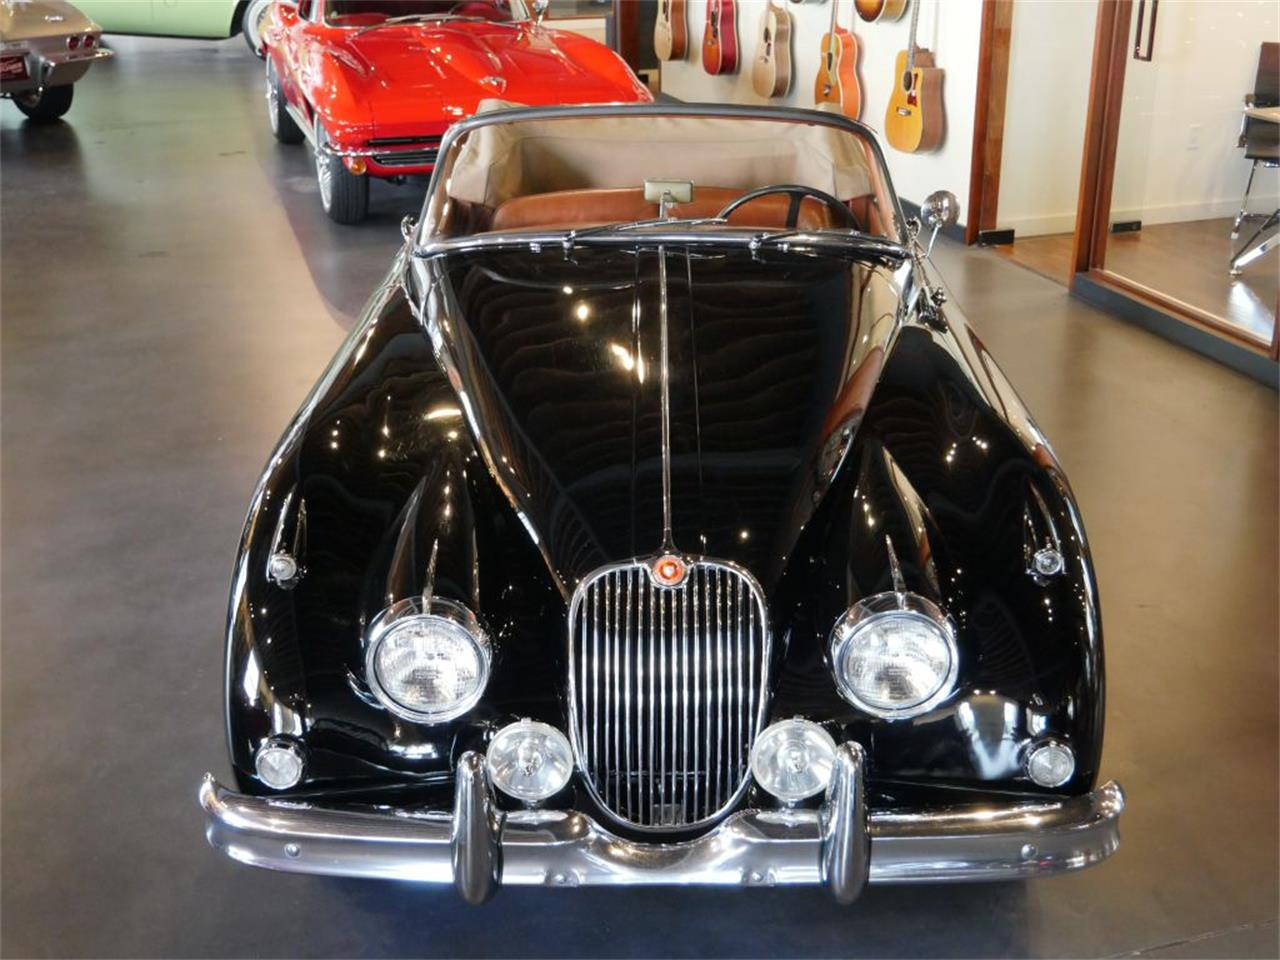 1961 Jaguar XK150 for sale in Miami, FL / classiccarsbay.com